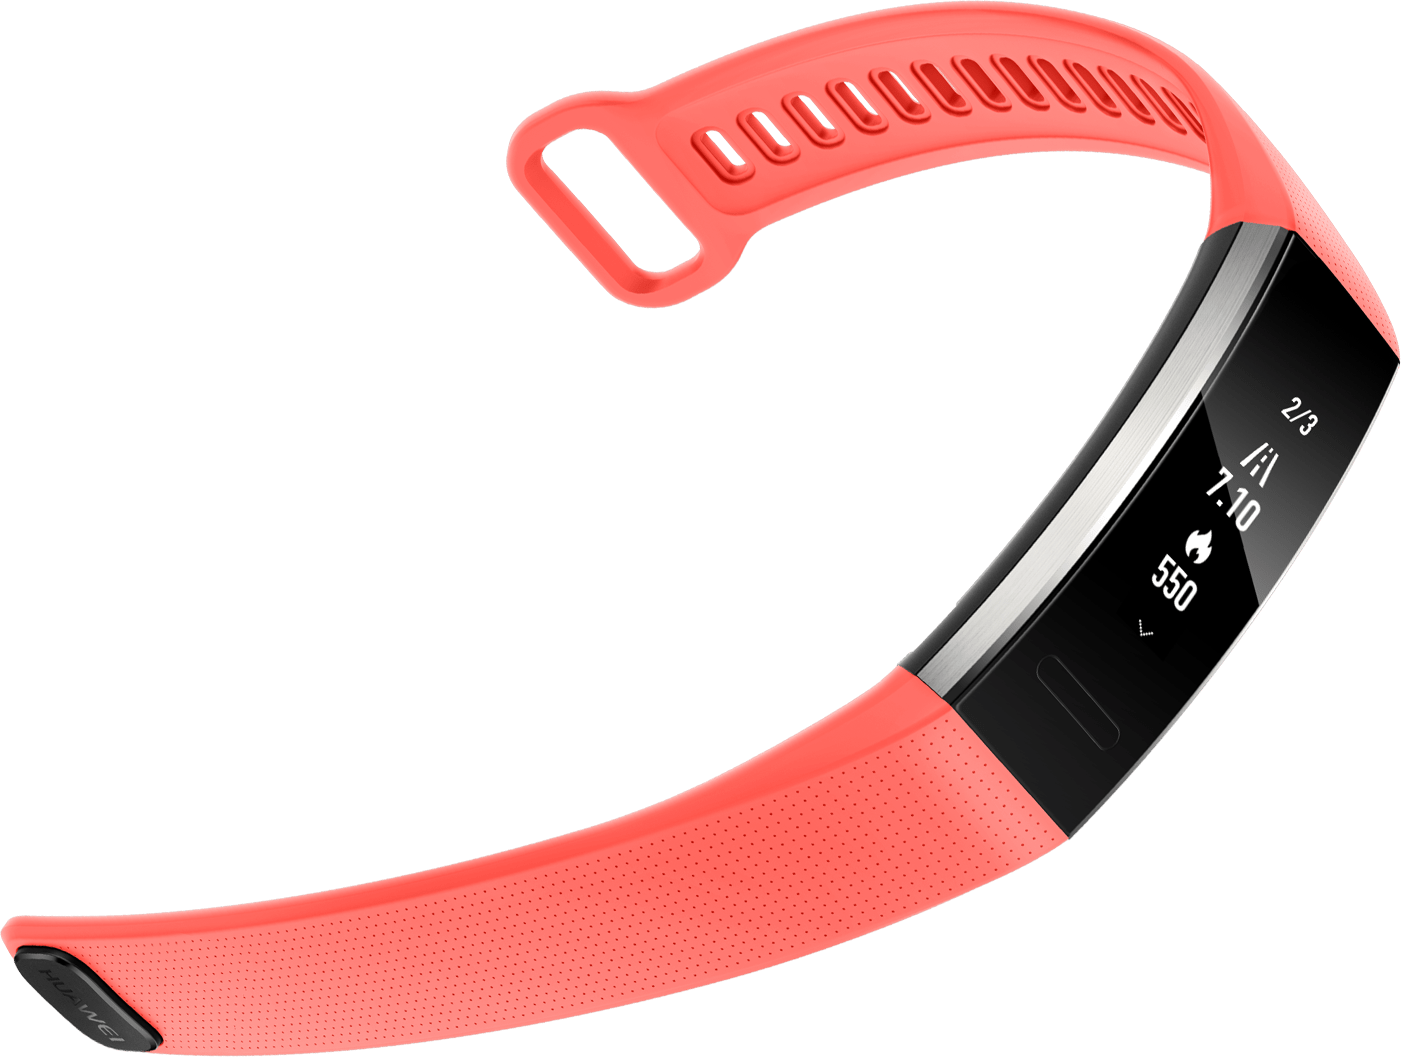 HUAWEI Band 2 and Band 2 Pro | Wearables | HUAWEI Global